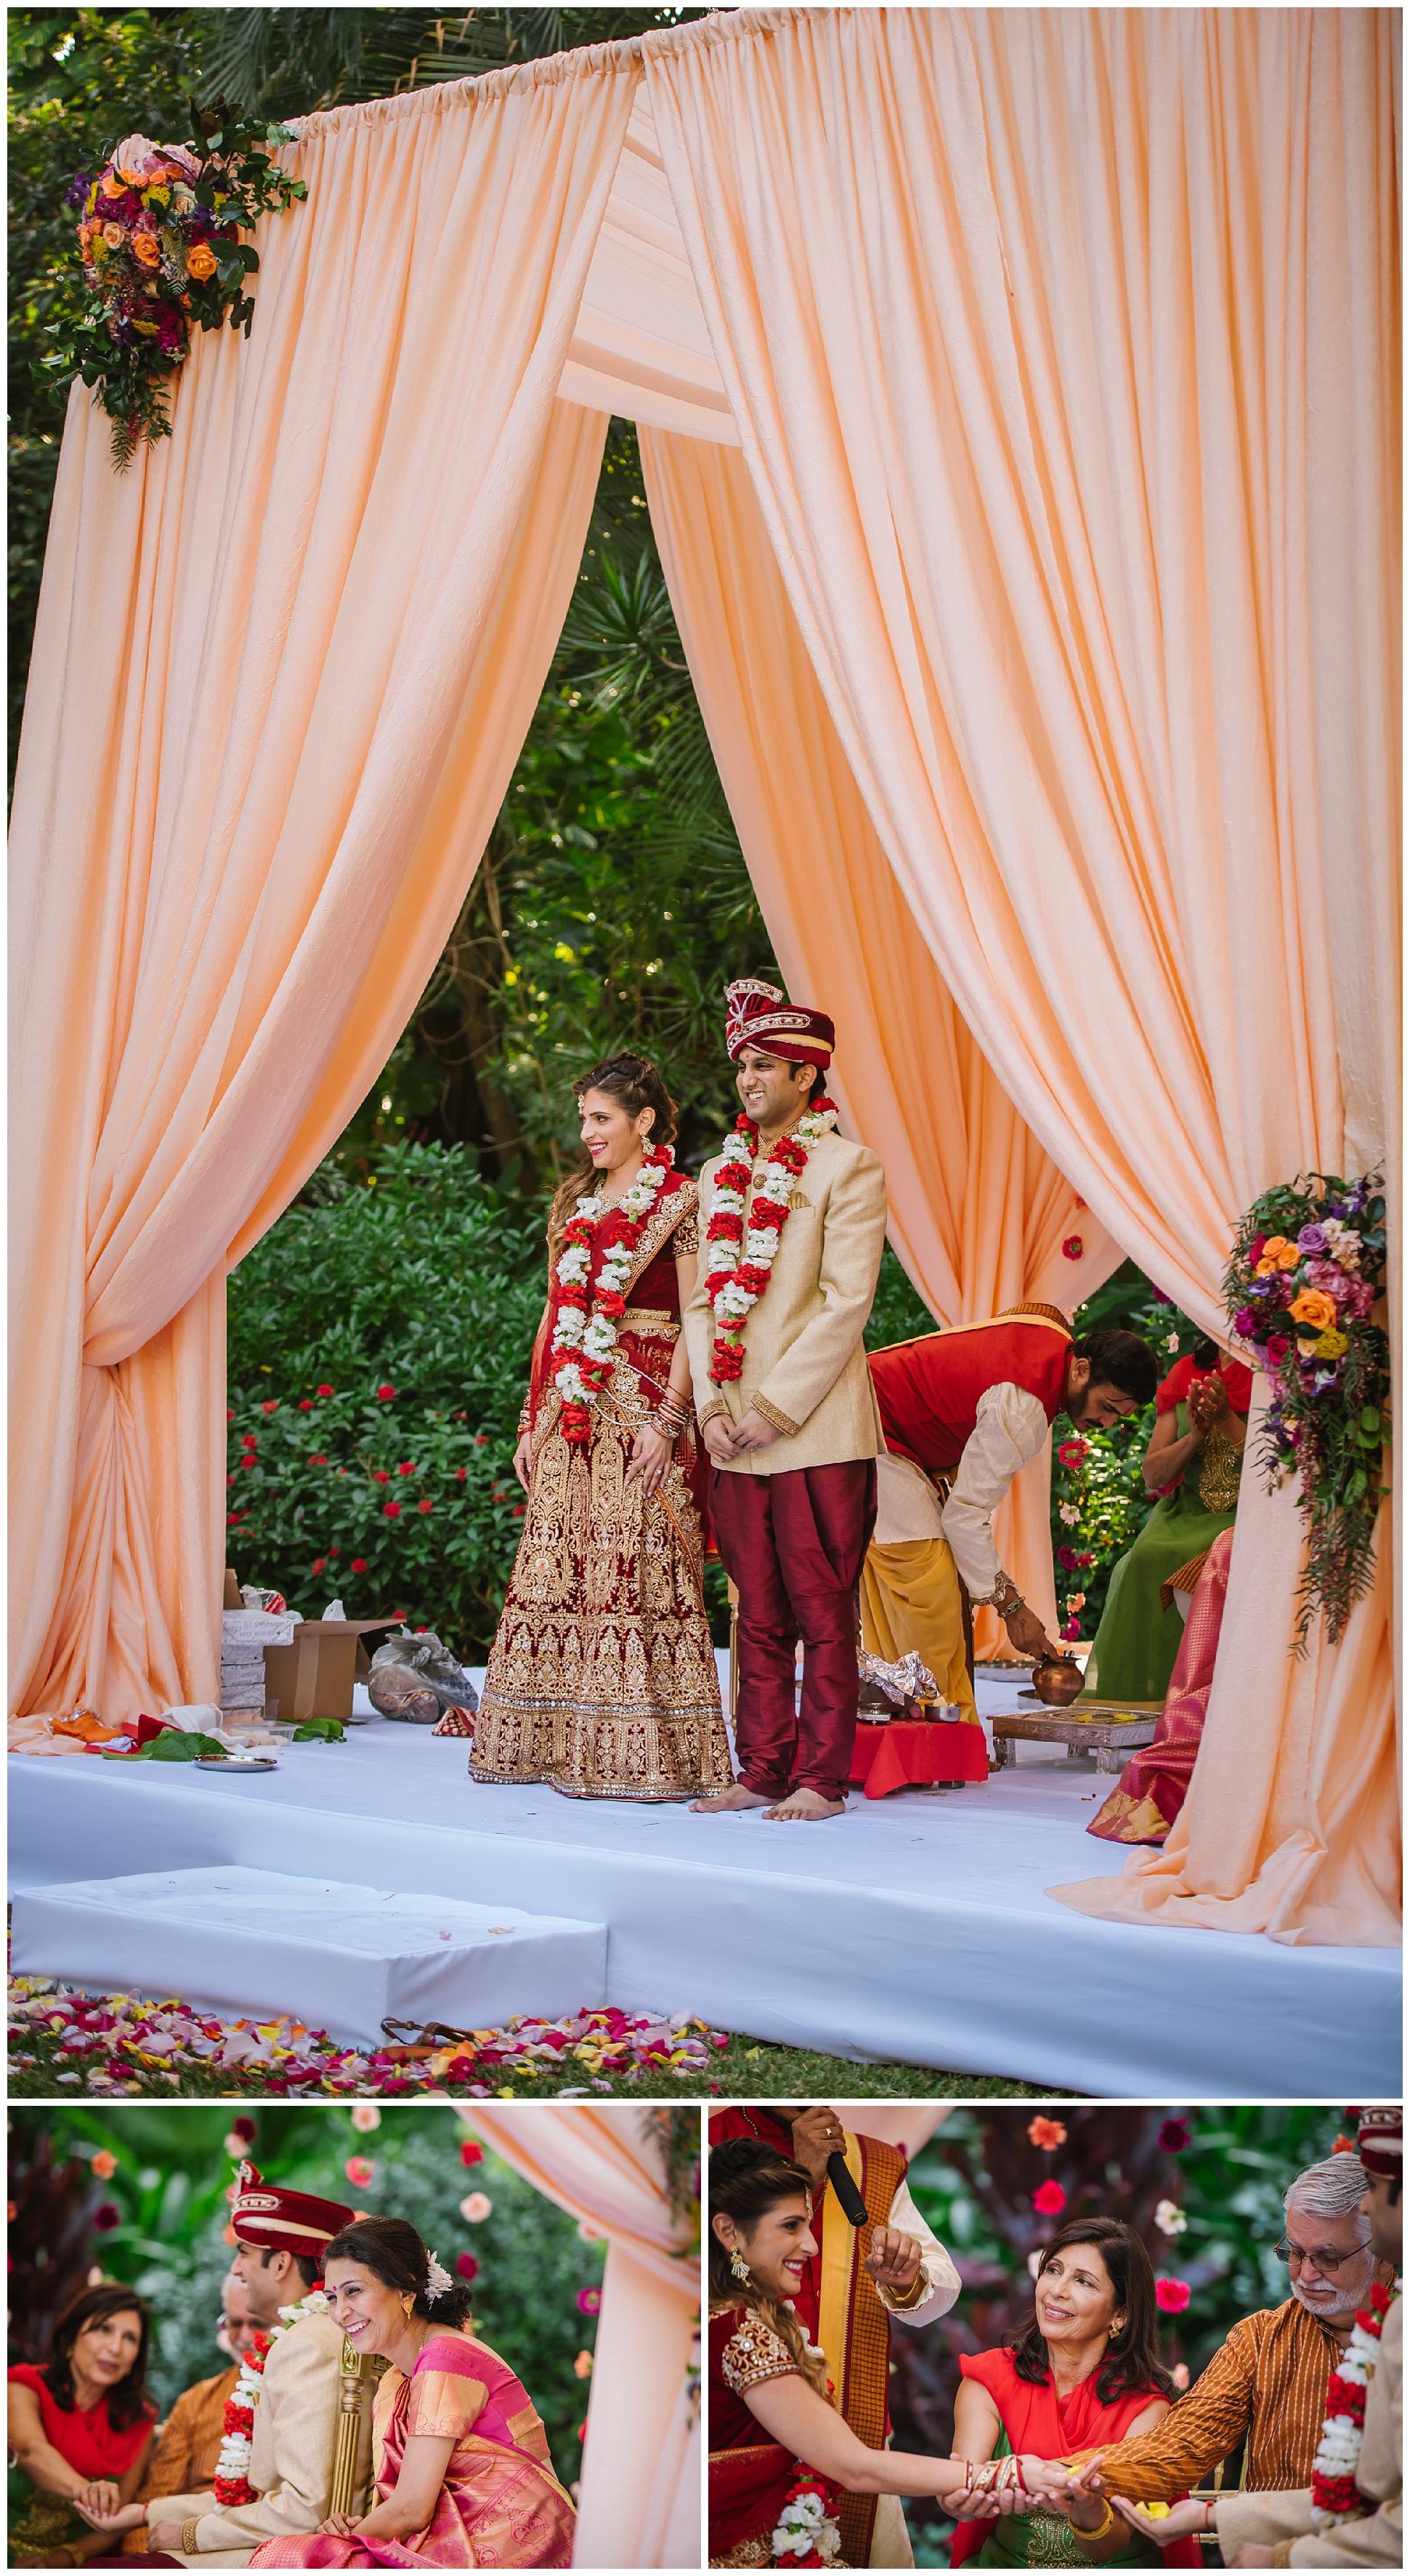 St-pete-indian-wedding-photographer-barat-sunken-gardens_0112.jpg